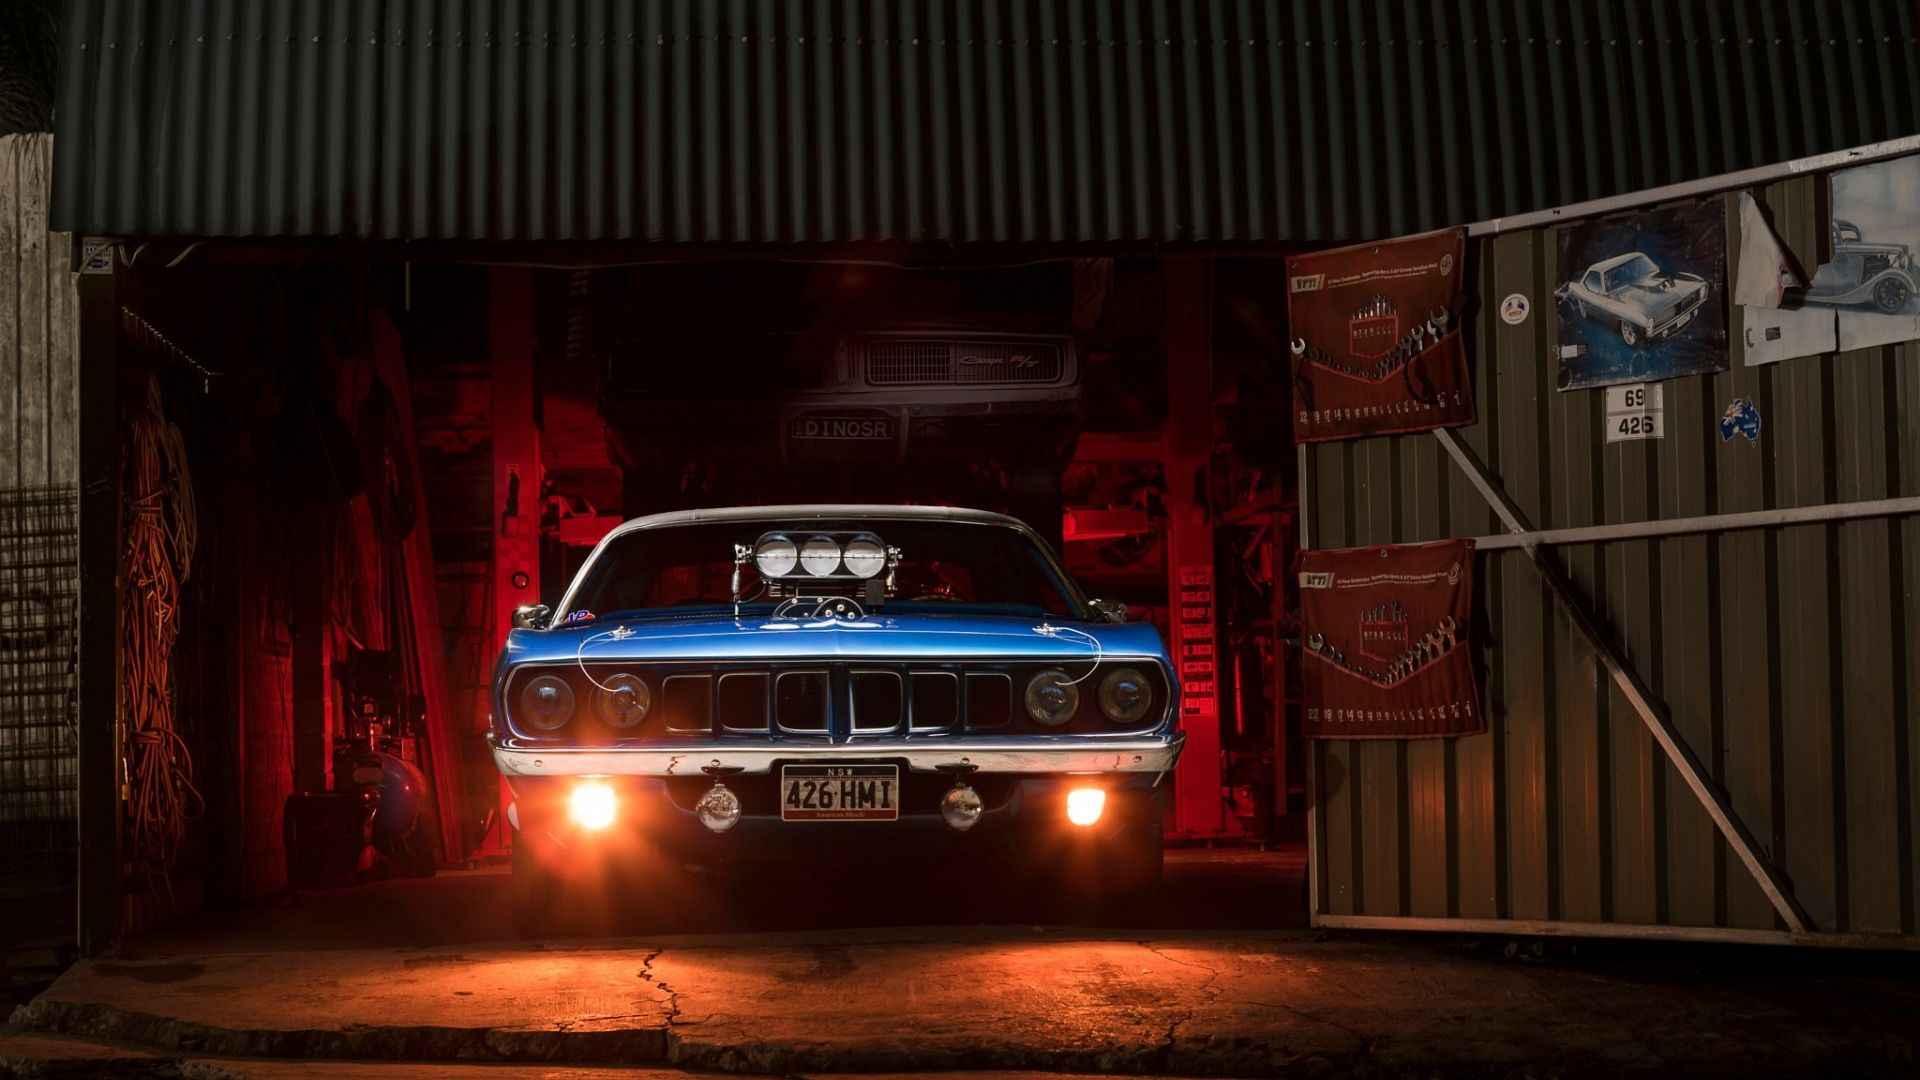 Plymouth Barracuda, classic, muscle car, garage Wallpaper